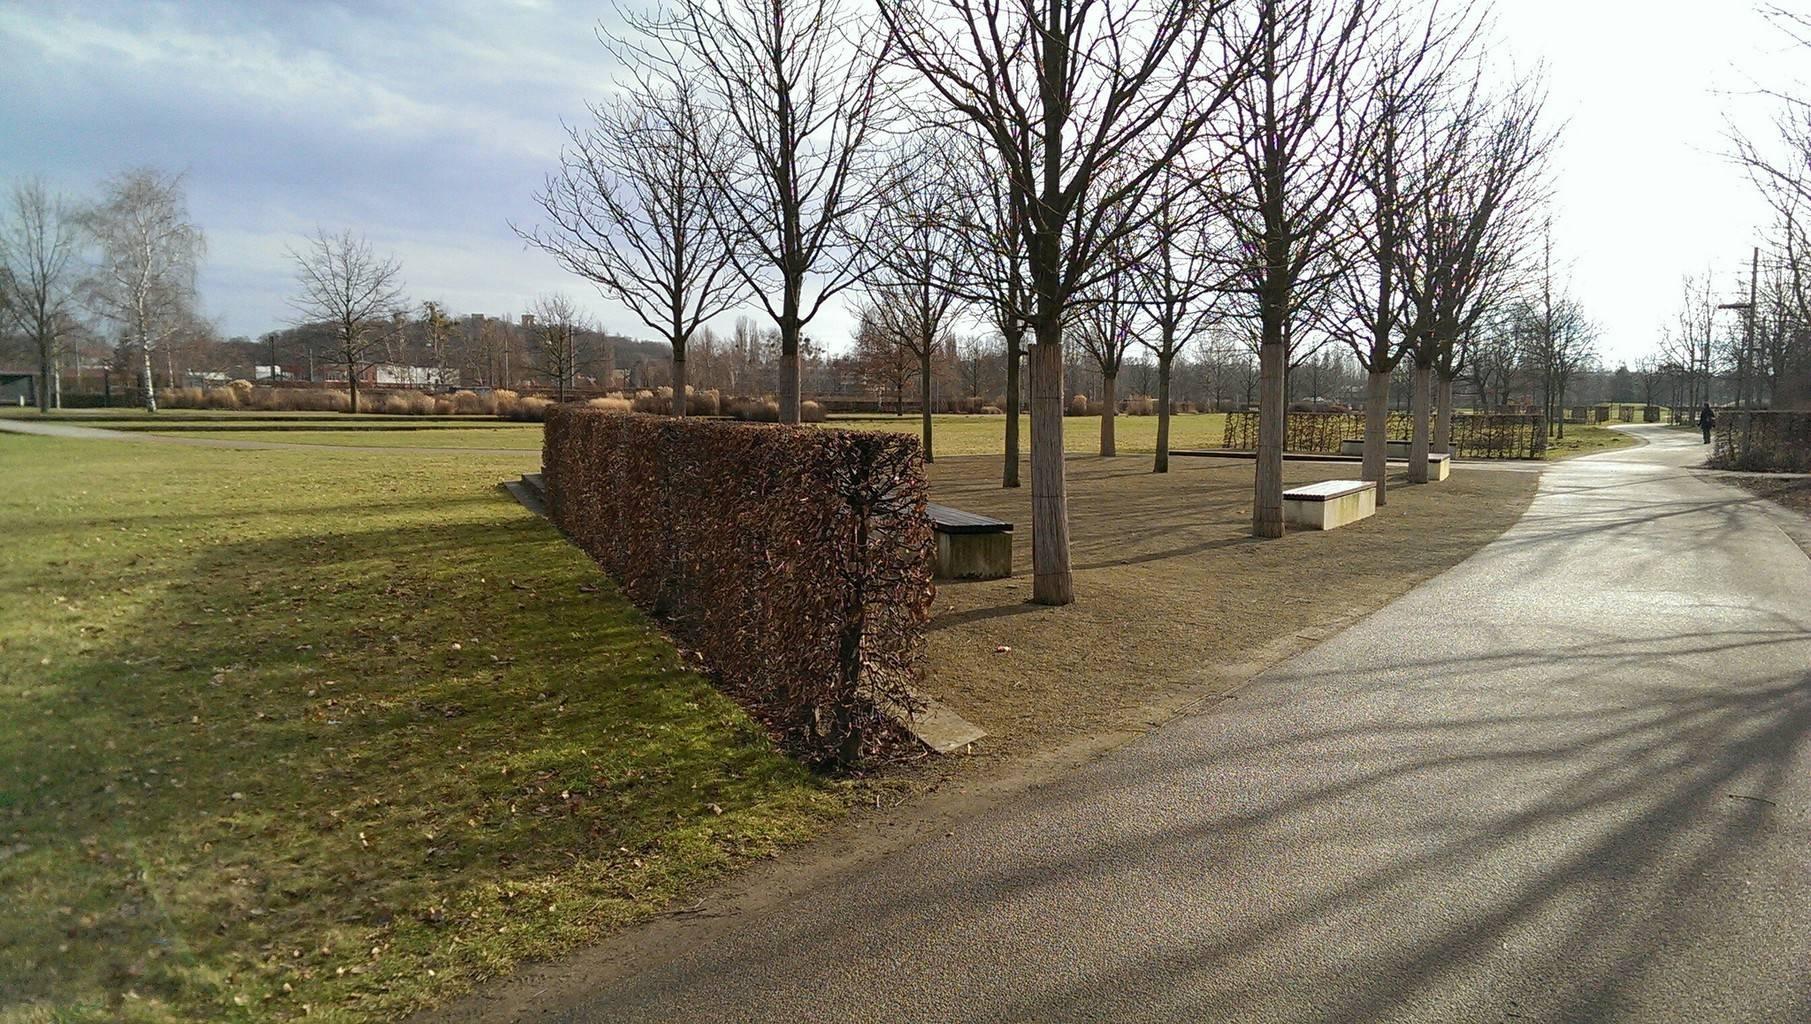 66 Seen Weg Etappe Marquardt Potsdam Rb Marquardt S Potsdam